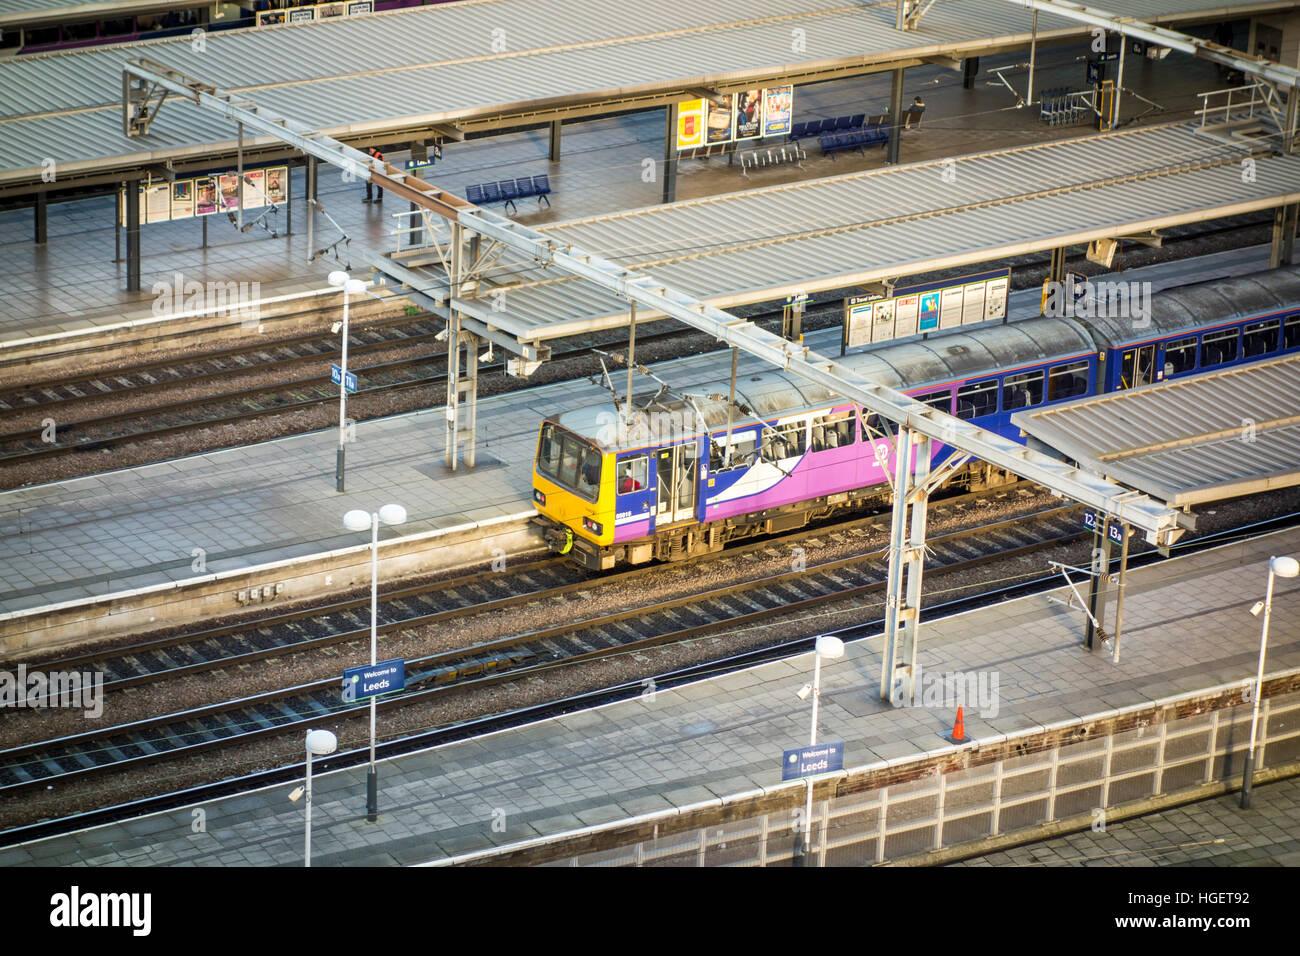 Pacer train sat at a platform in Leeds Station. - Stock Image